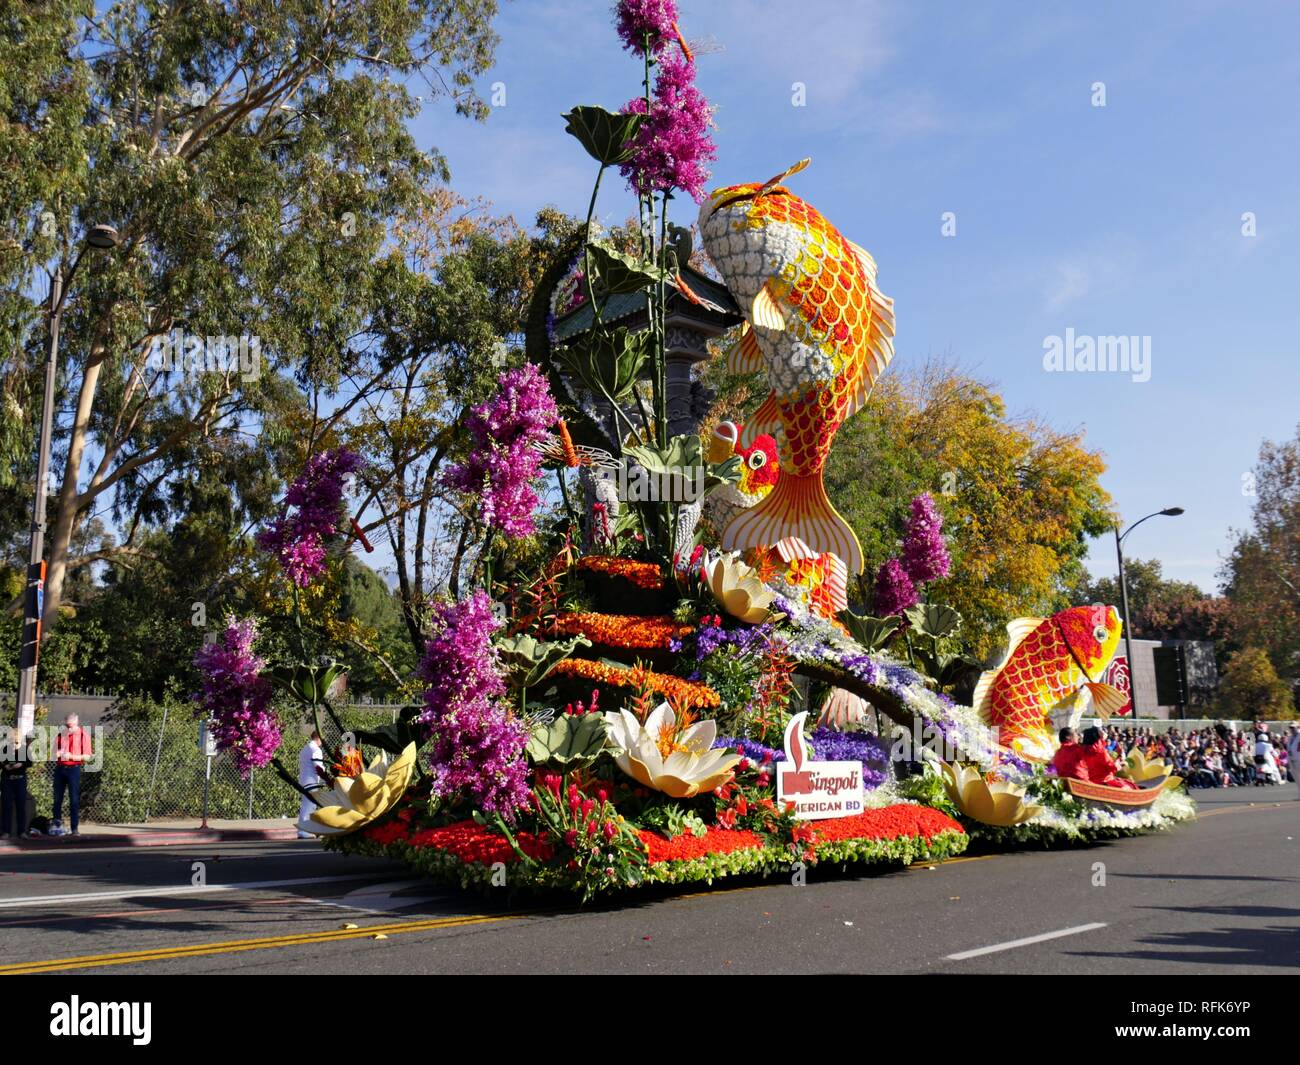 PASADENA, CALIFORNIA—JANUARY 1, 2018: The Singpoli American